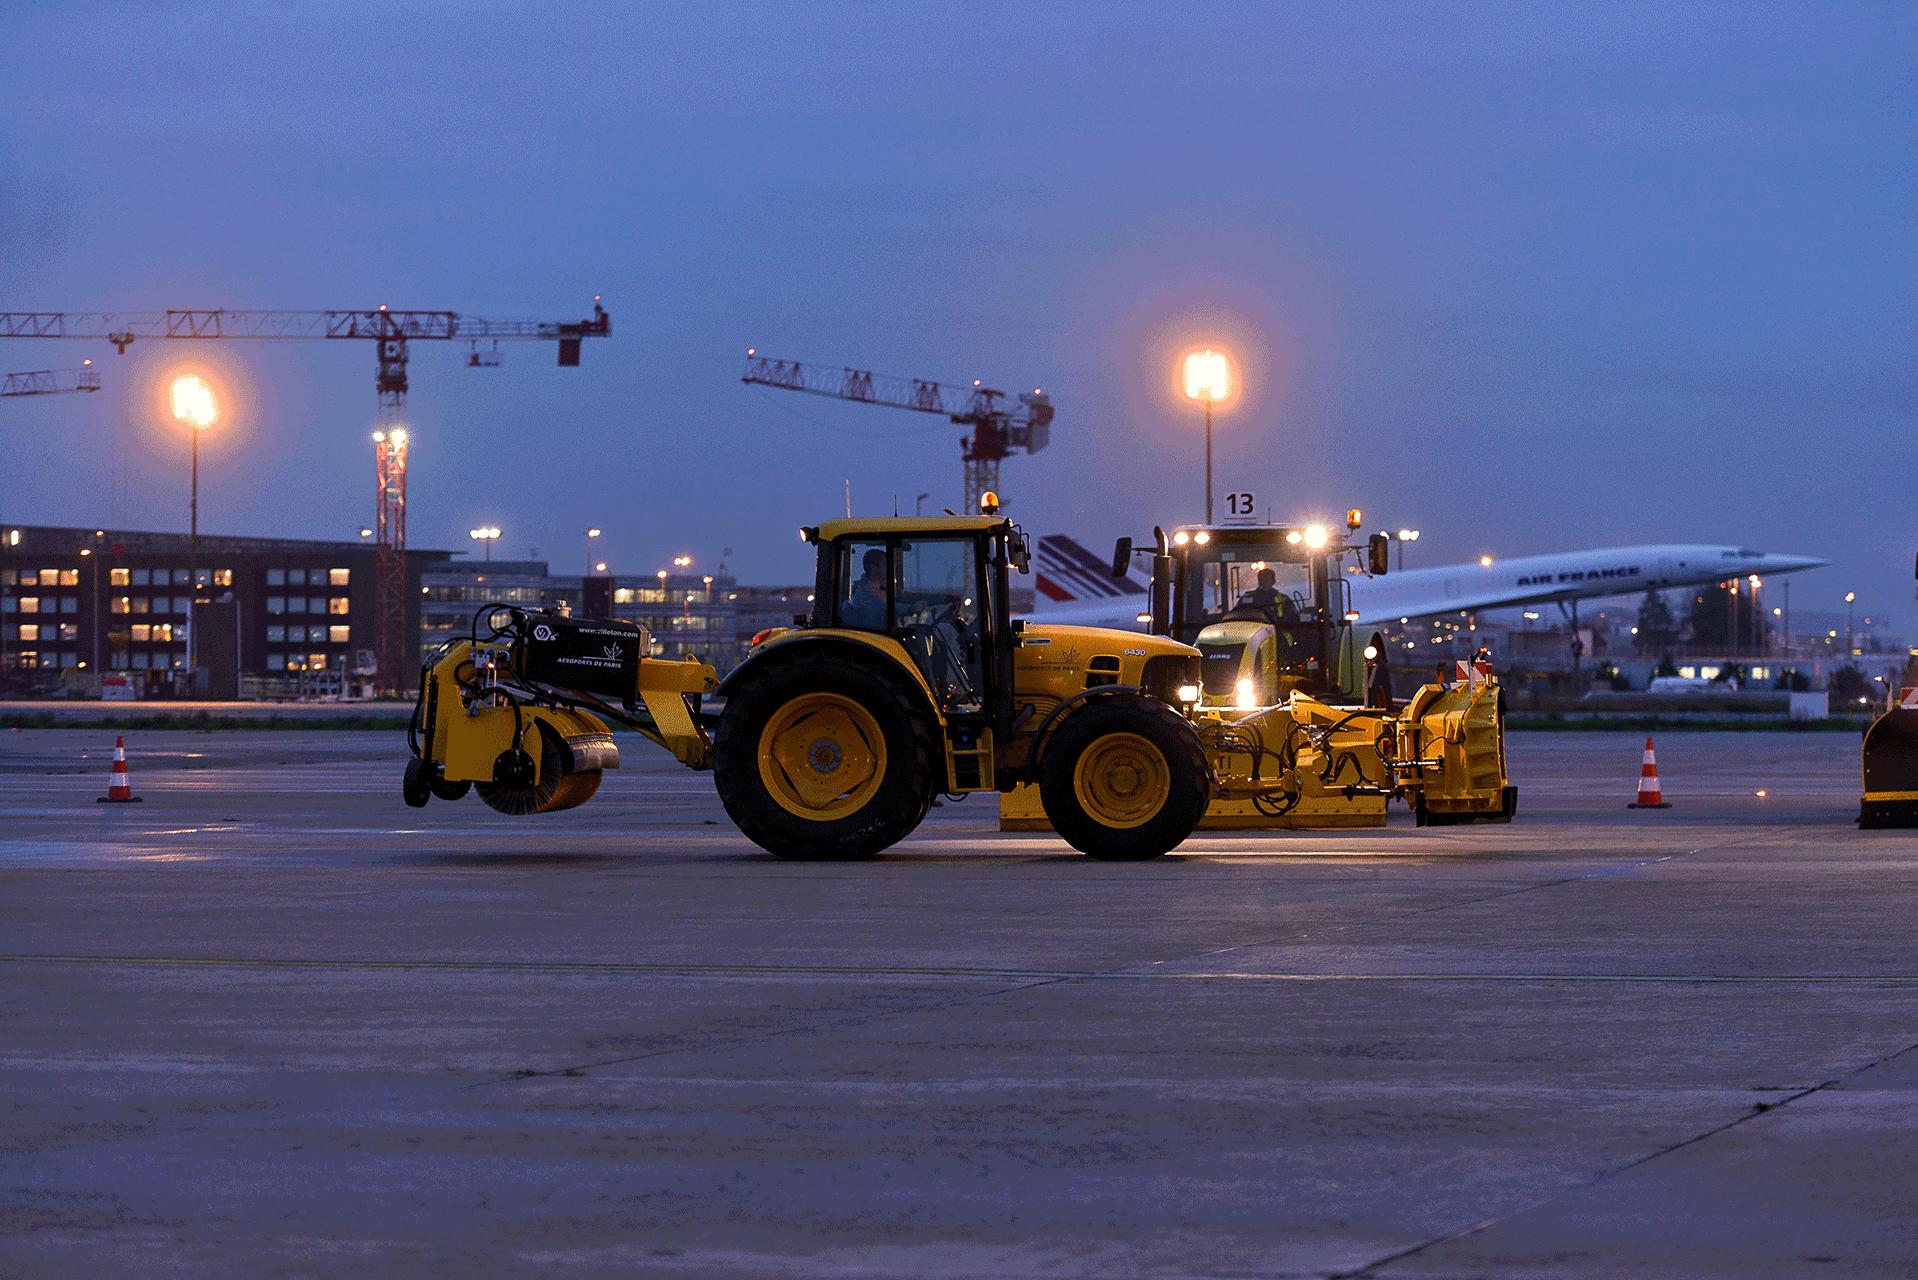 roissy-paris-aeroport-photo-corporate-ile-de-france